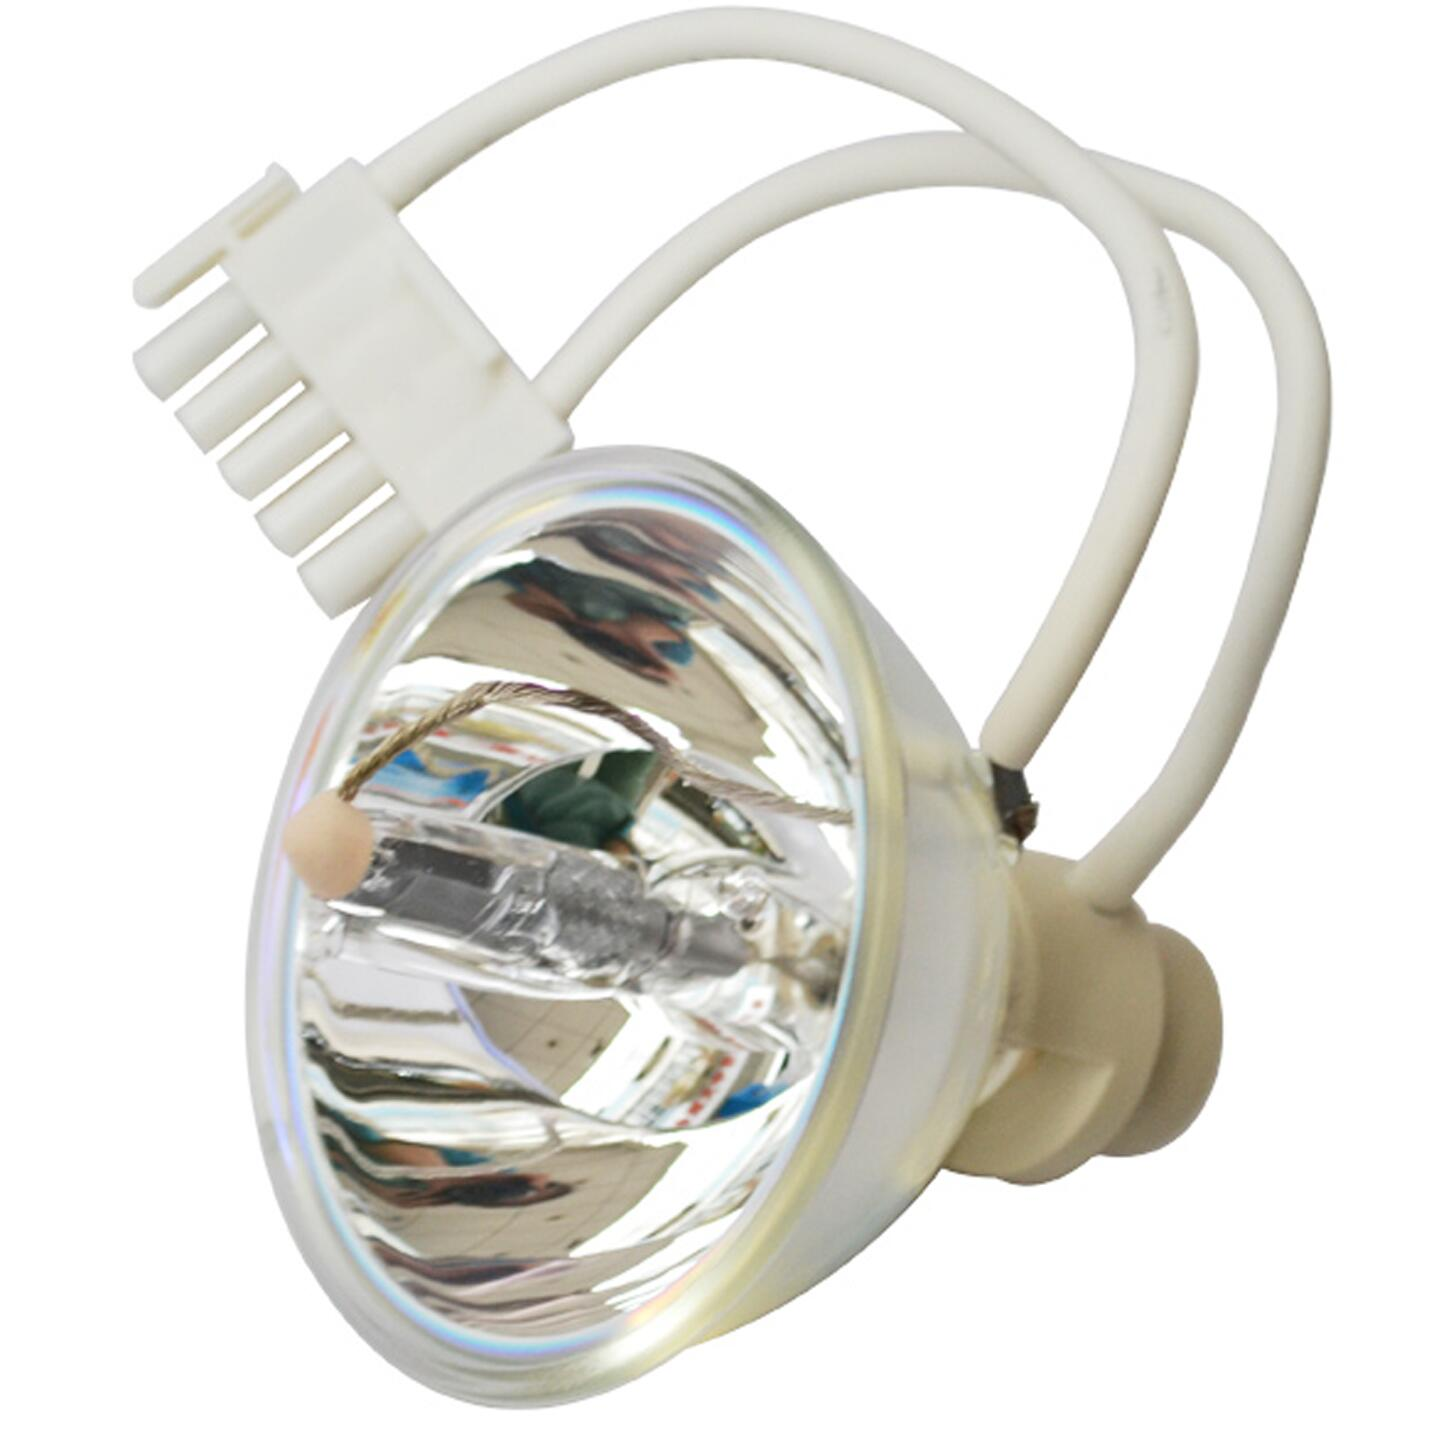 kit xenon conversion hid lamp